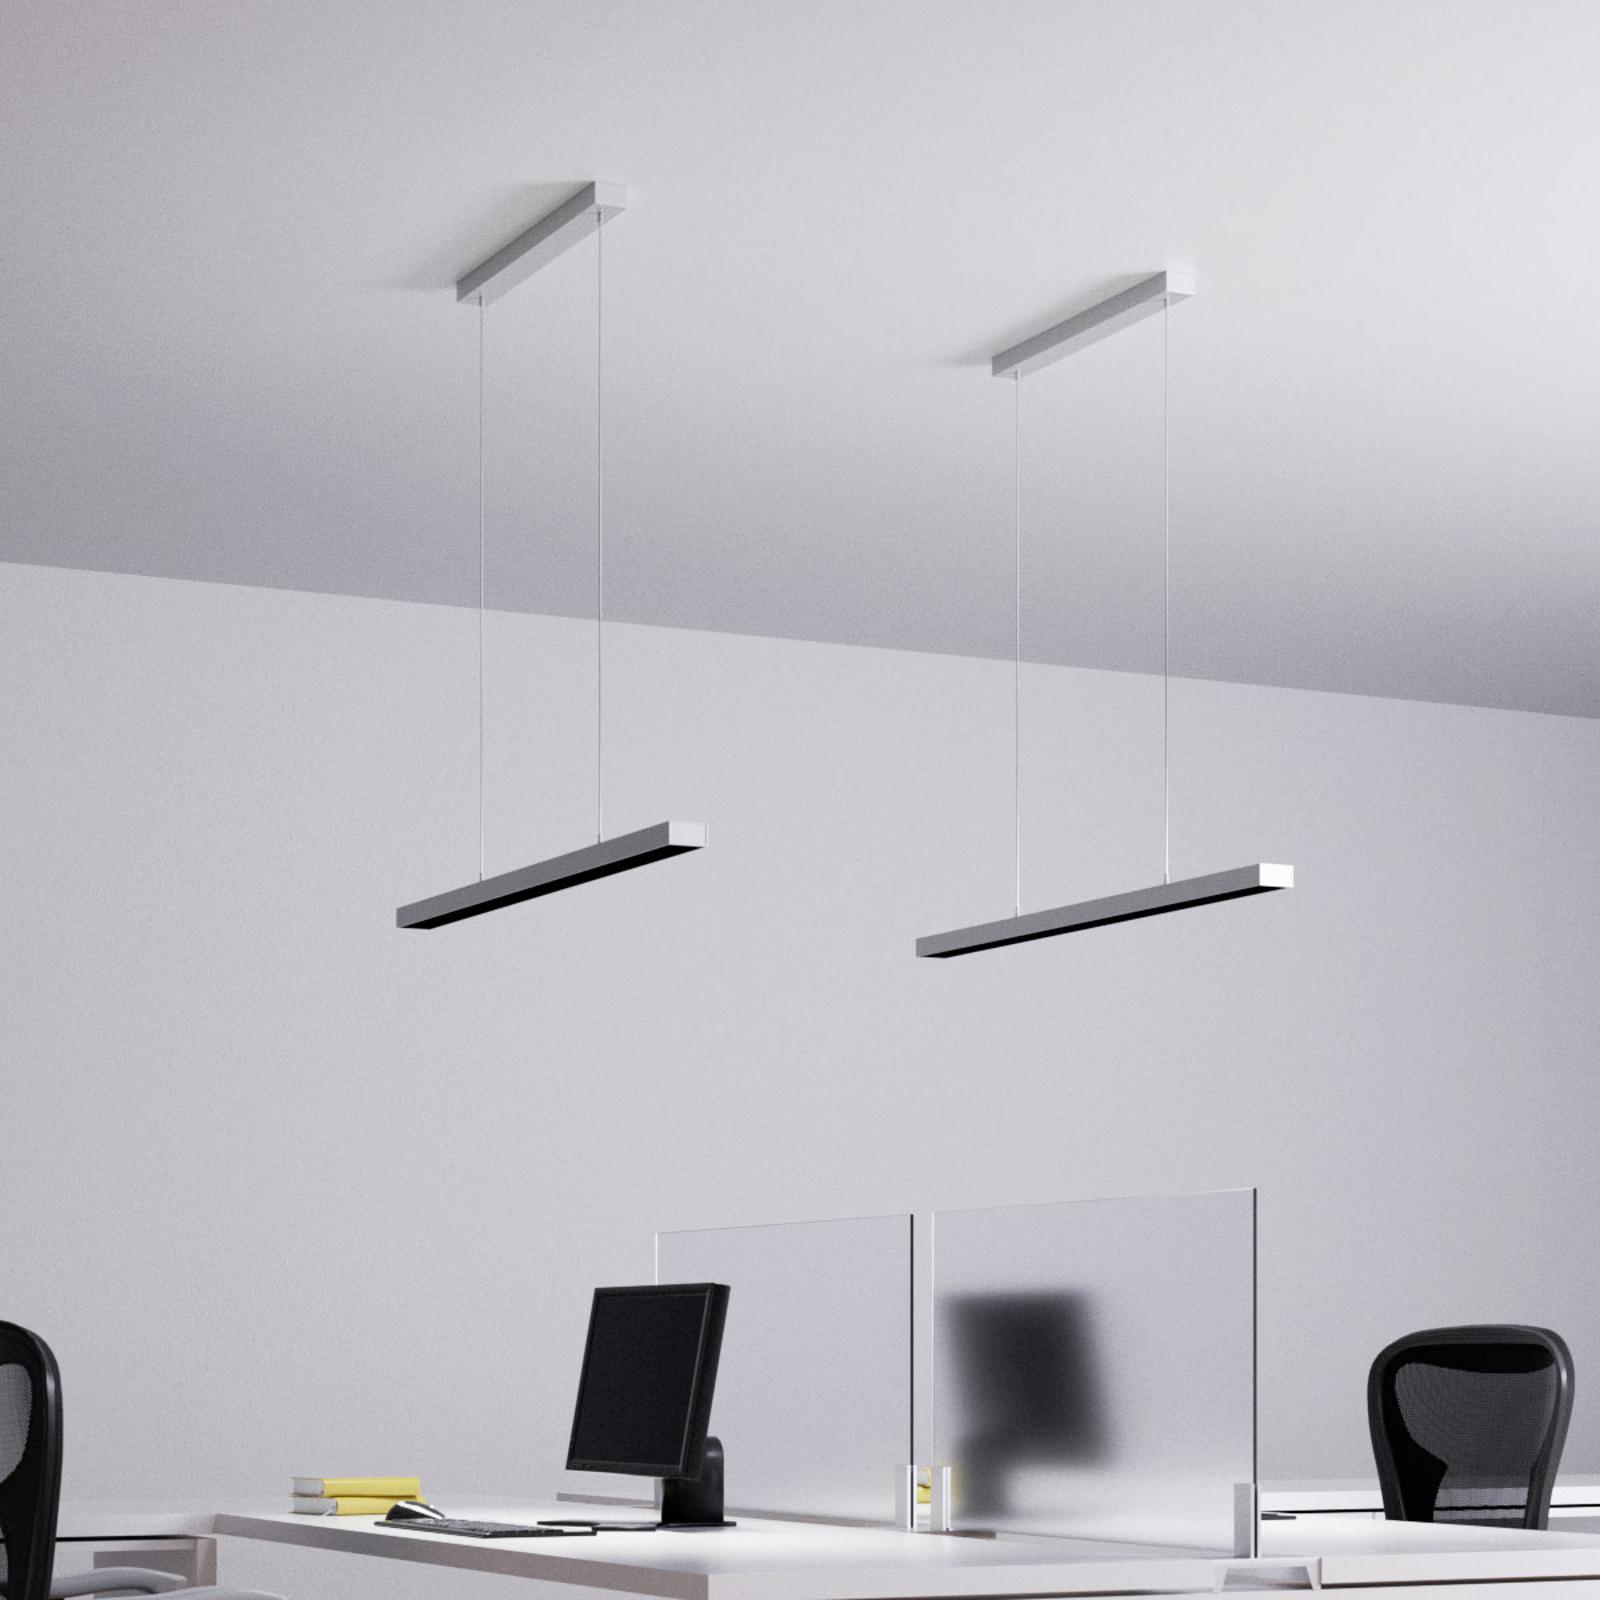 Arbeitszimmer-LED-Hängelampe Jolinda, DALI dimmbar